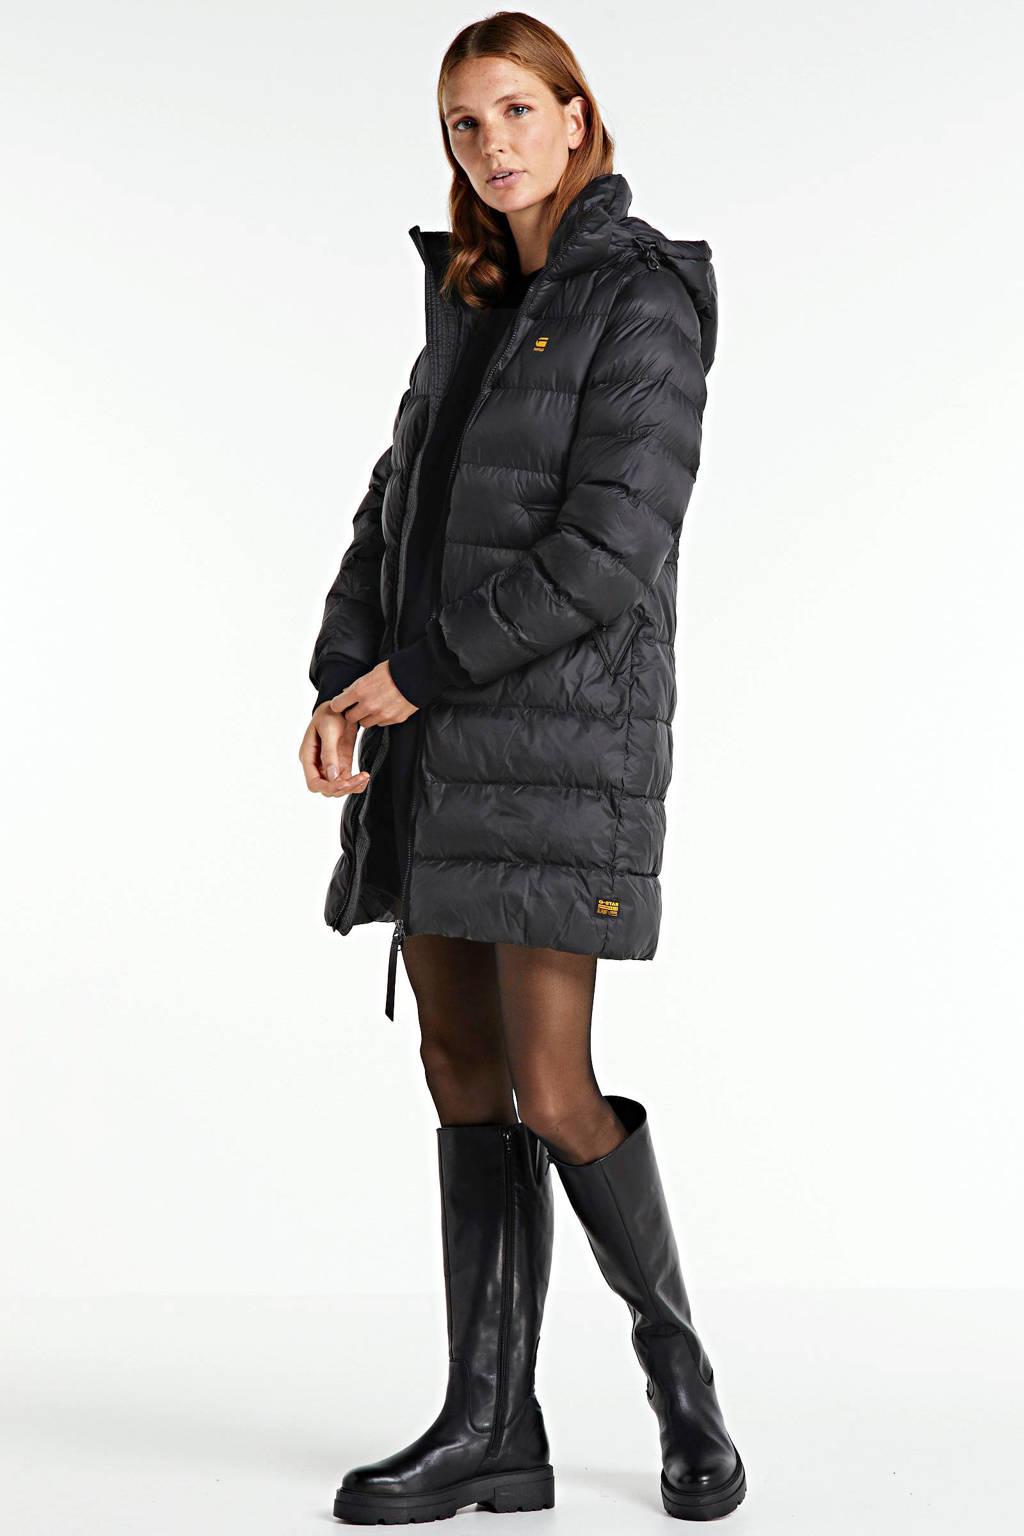 G-Star RAW gewatteerde jas met afneembare capuchon Whistler dk black, Zwart